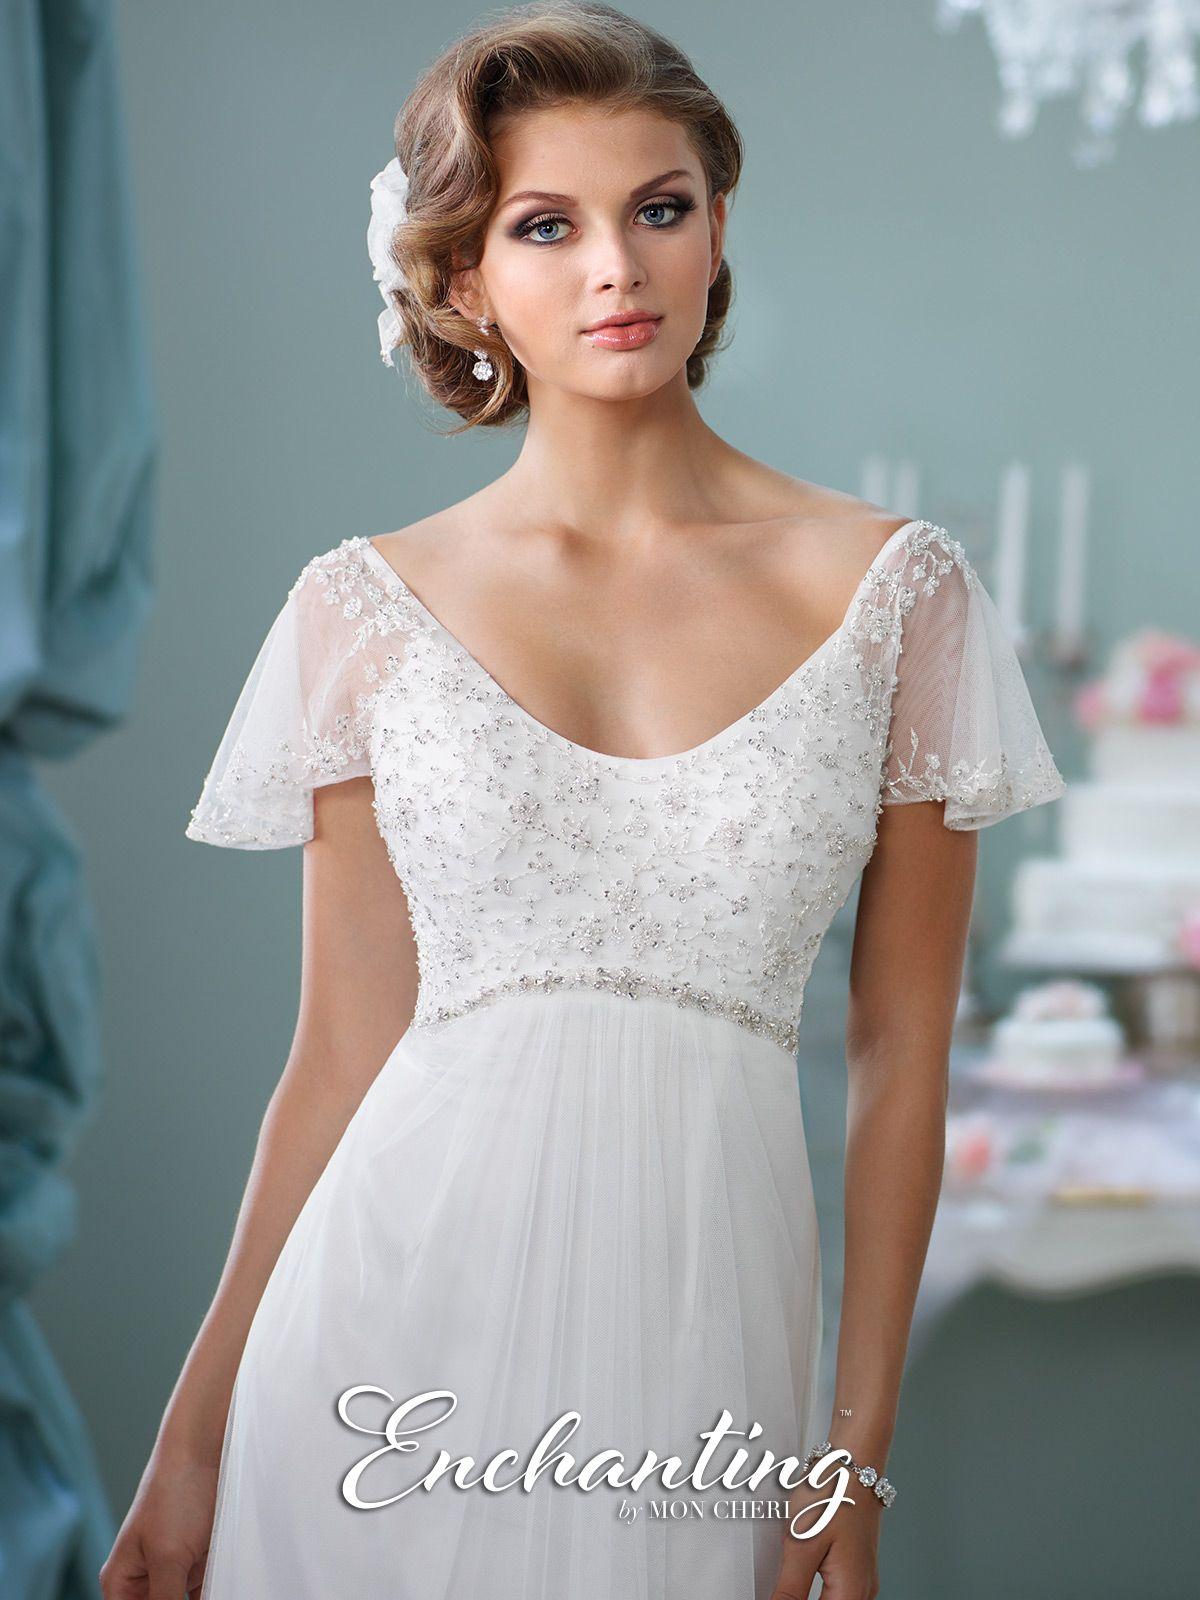 Modern wedding dresses by mon cheri ivory white destination